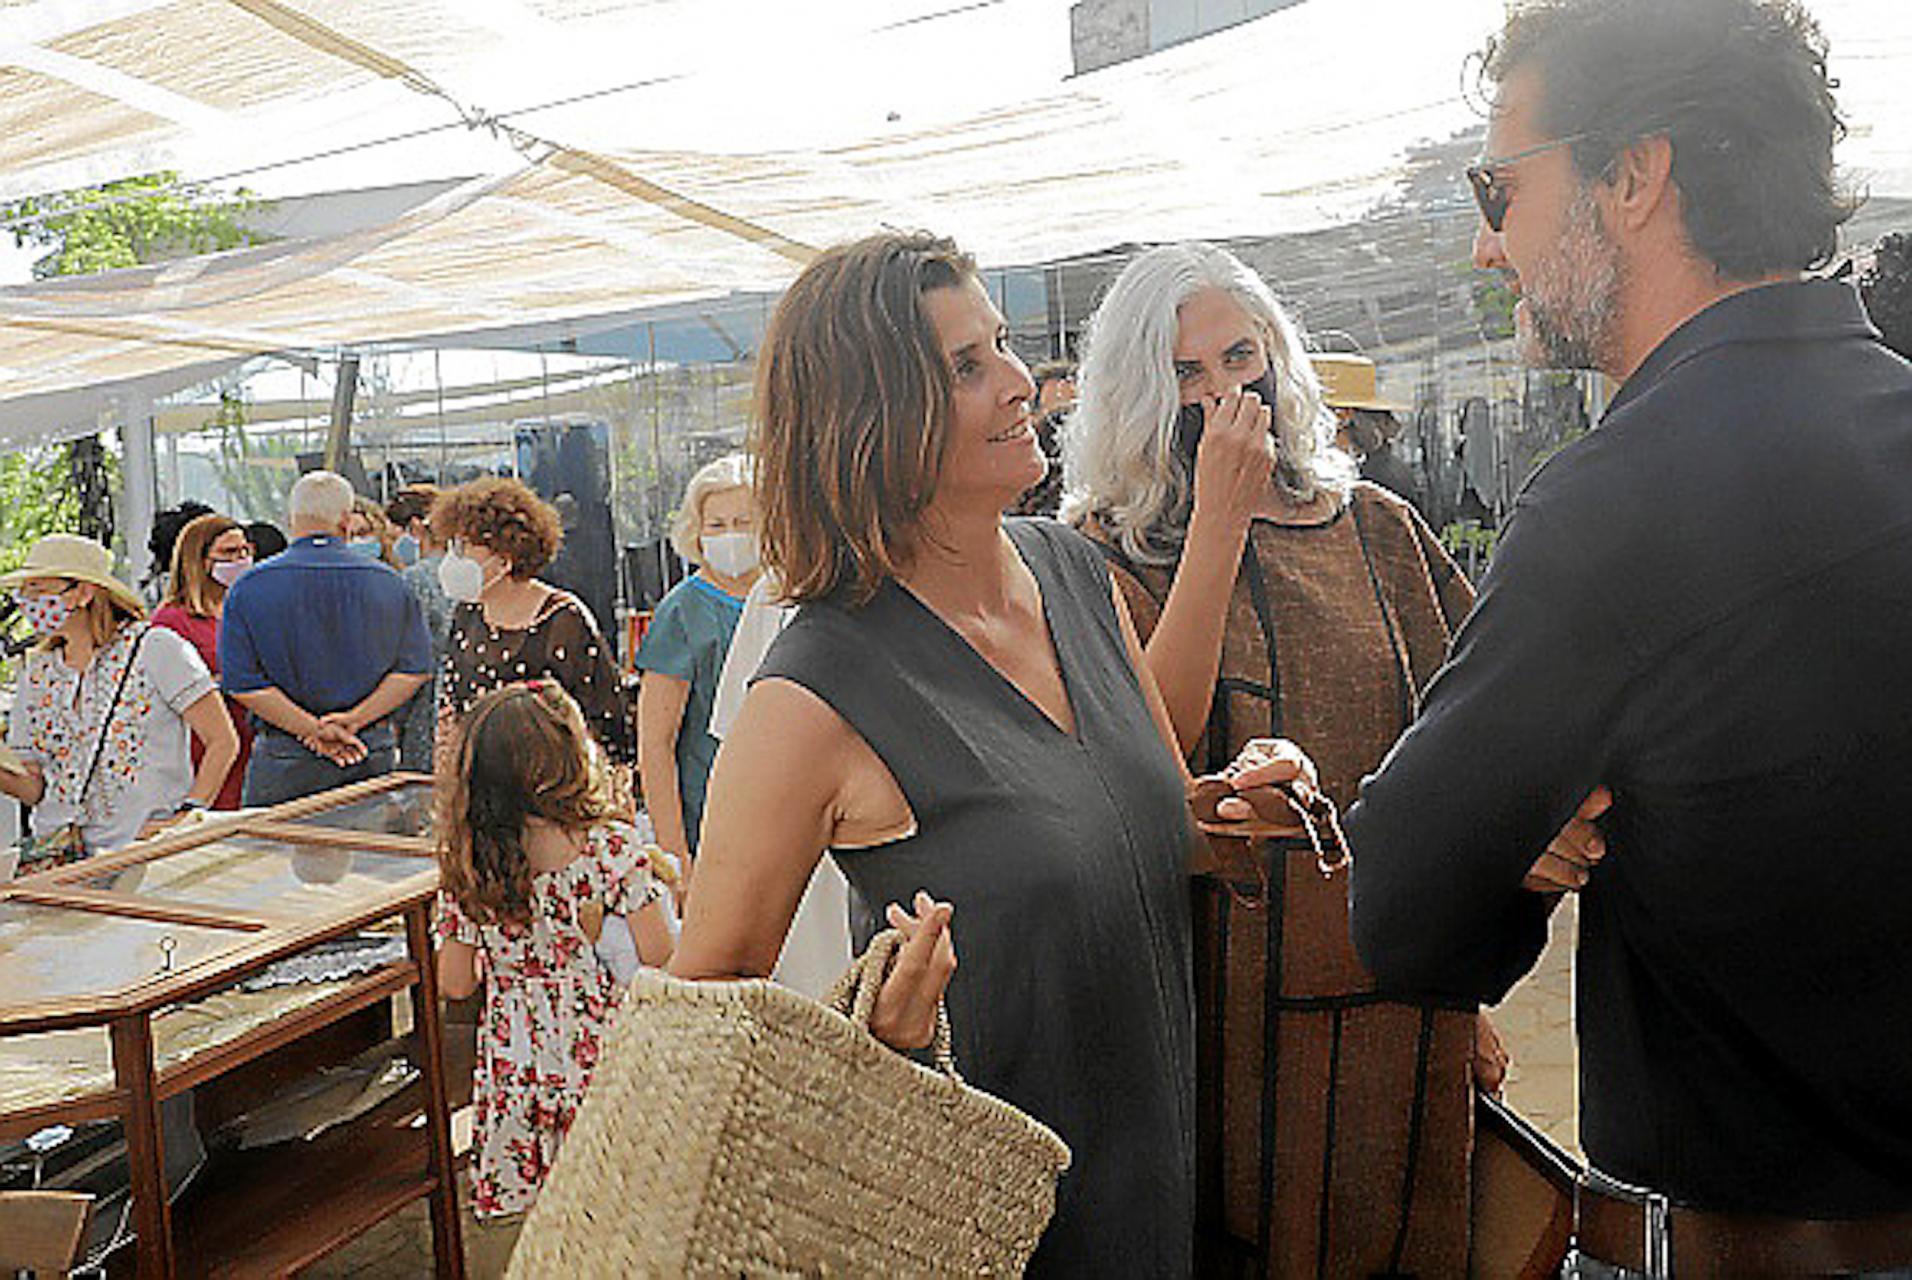 Rosario Nadal, Maria Antonia Horrach & Javier Goyeneche at the Xtant 2021 Textile Craft Exhibition.